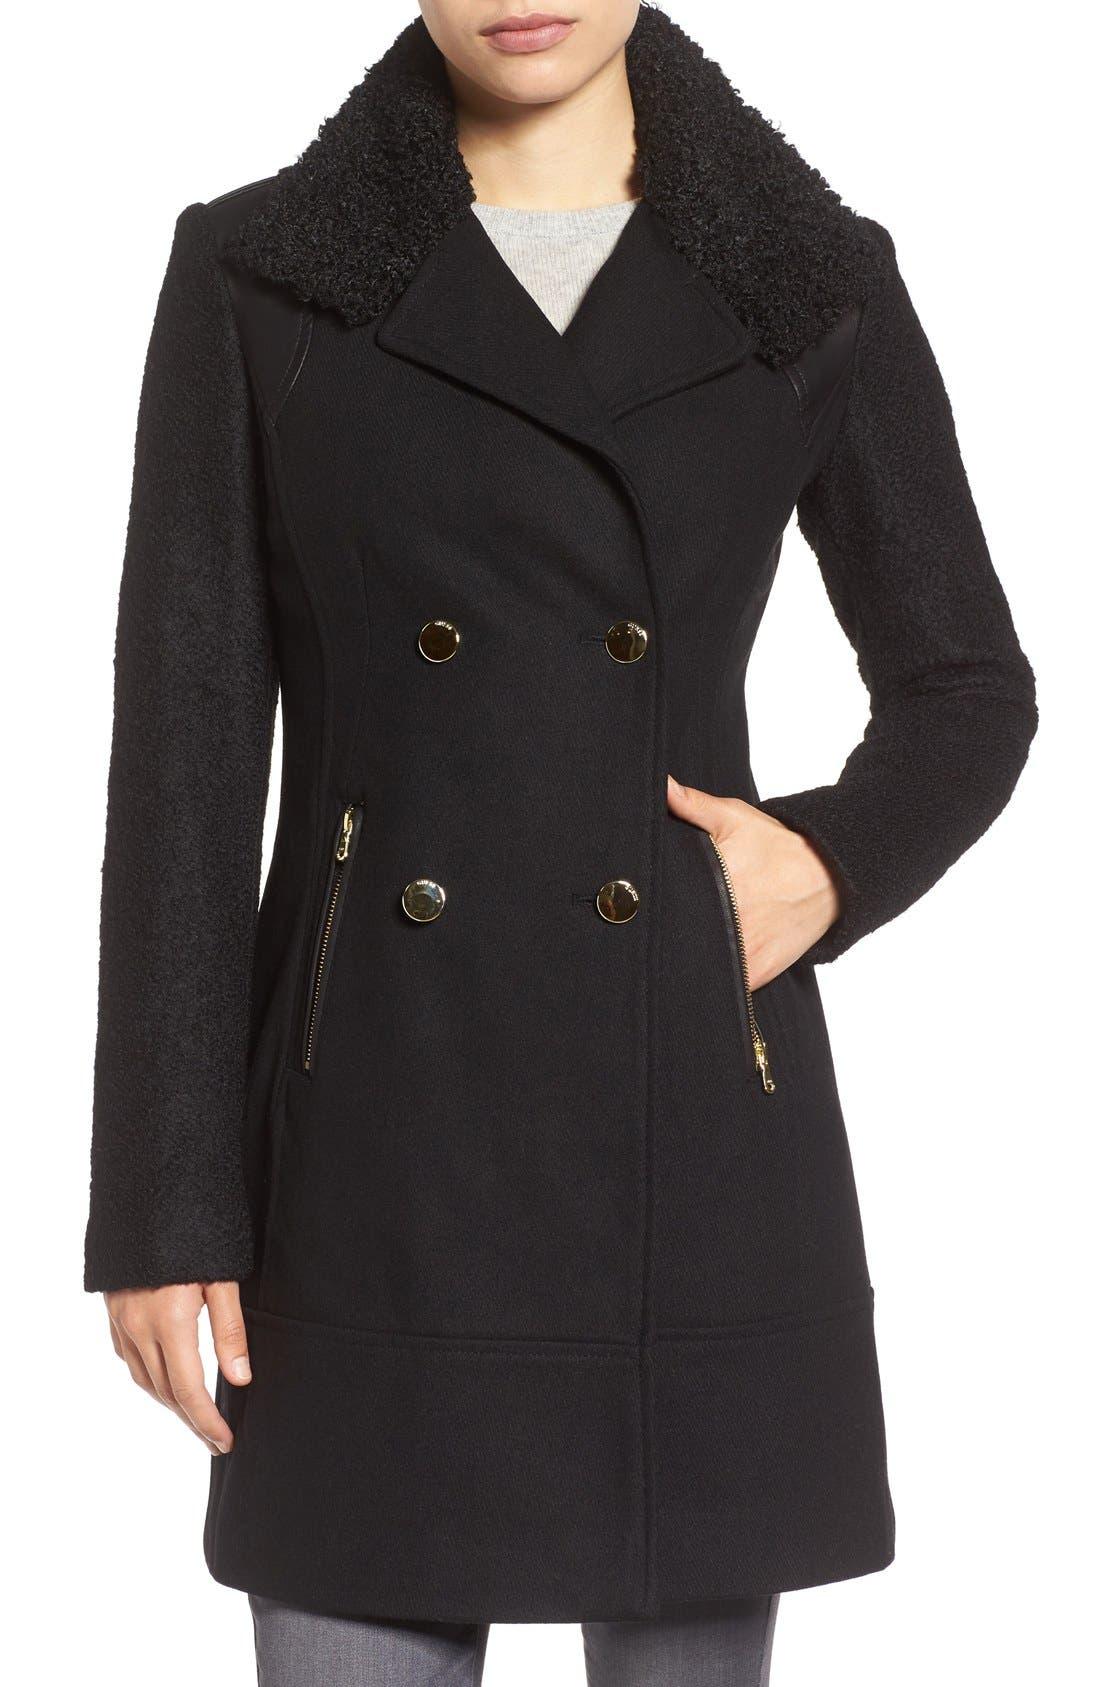 Bouclé Sleeve Wool Blend Military Coat,                             Main thumbnail 1, color,                             Black